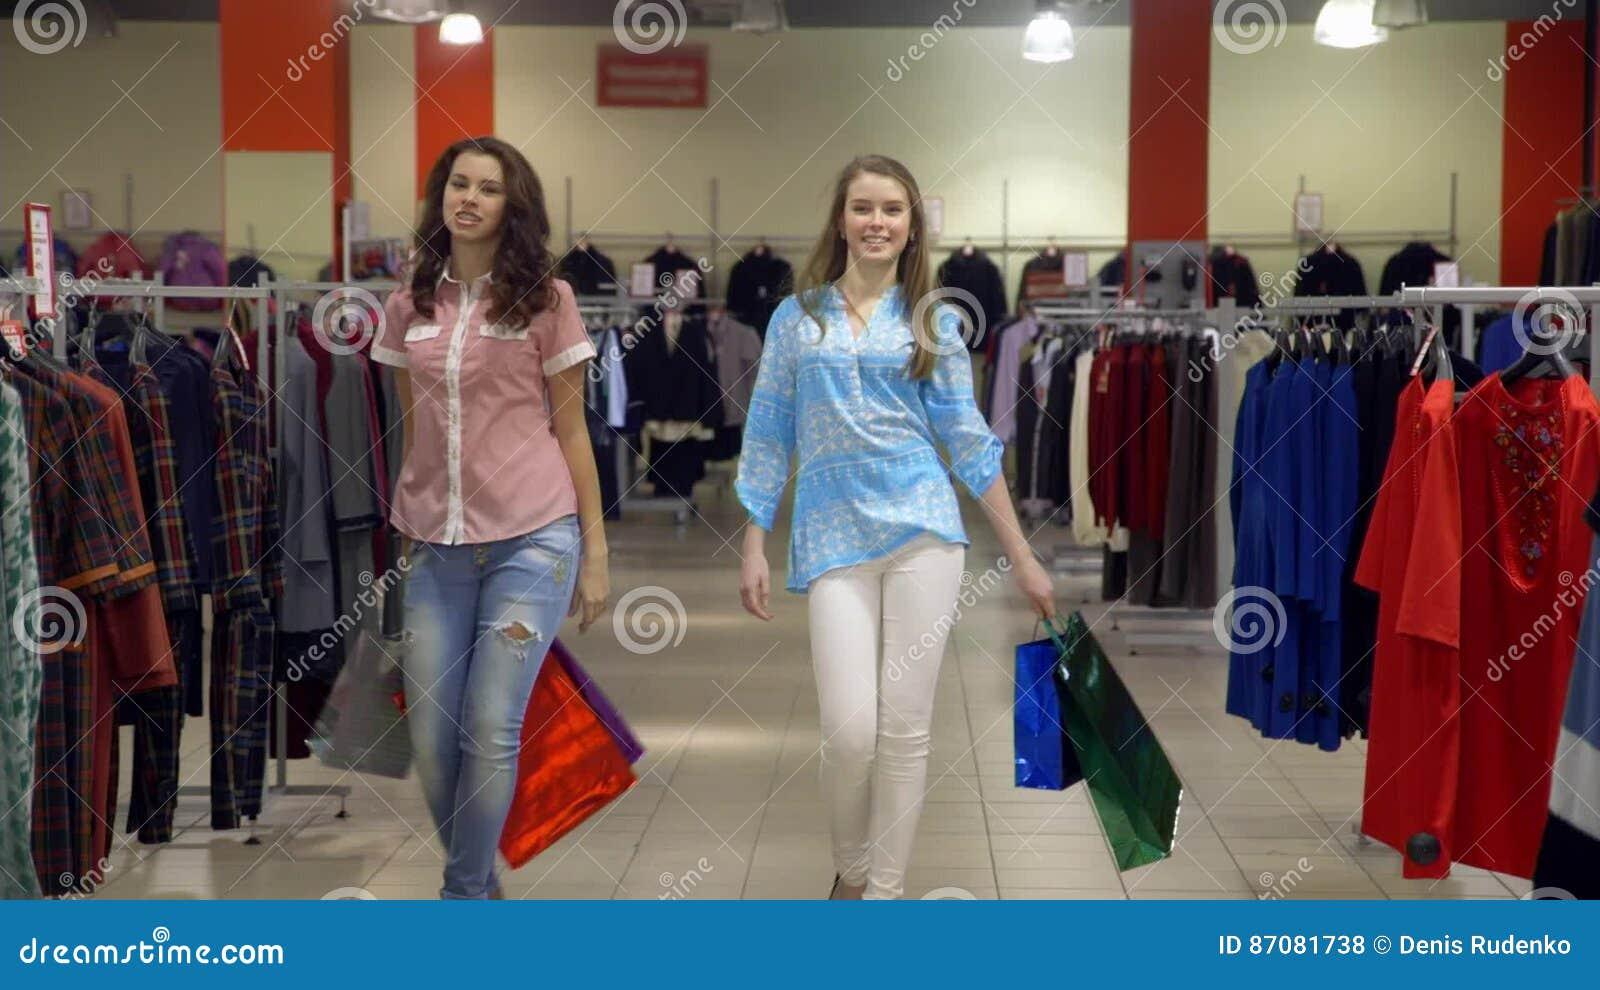 naked-neighbor-pretty-girls-store